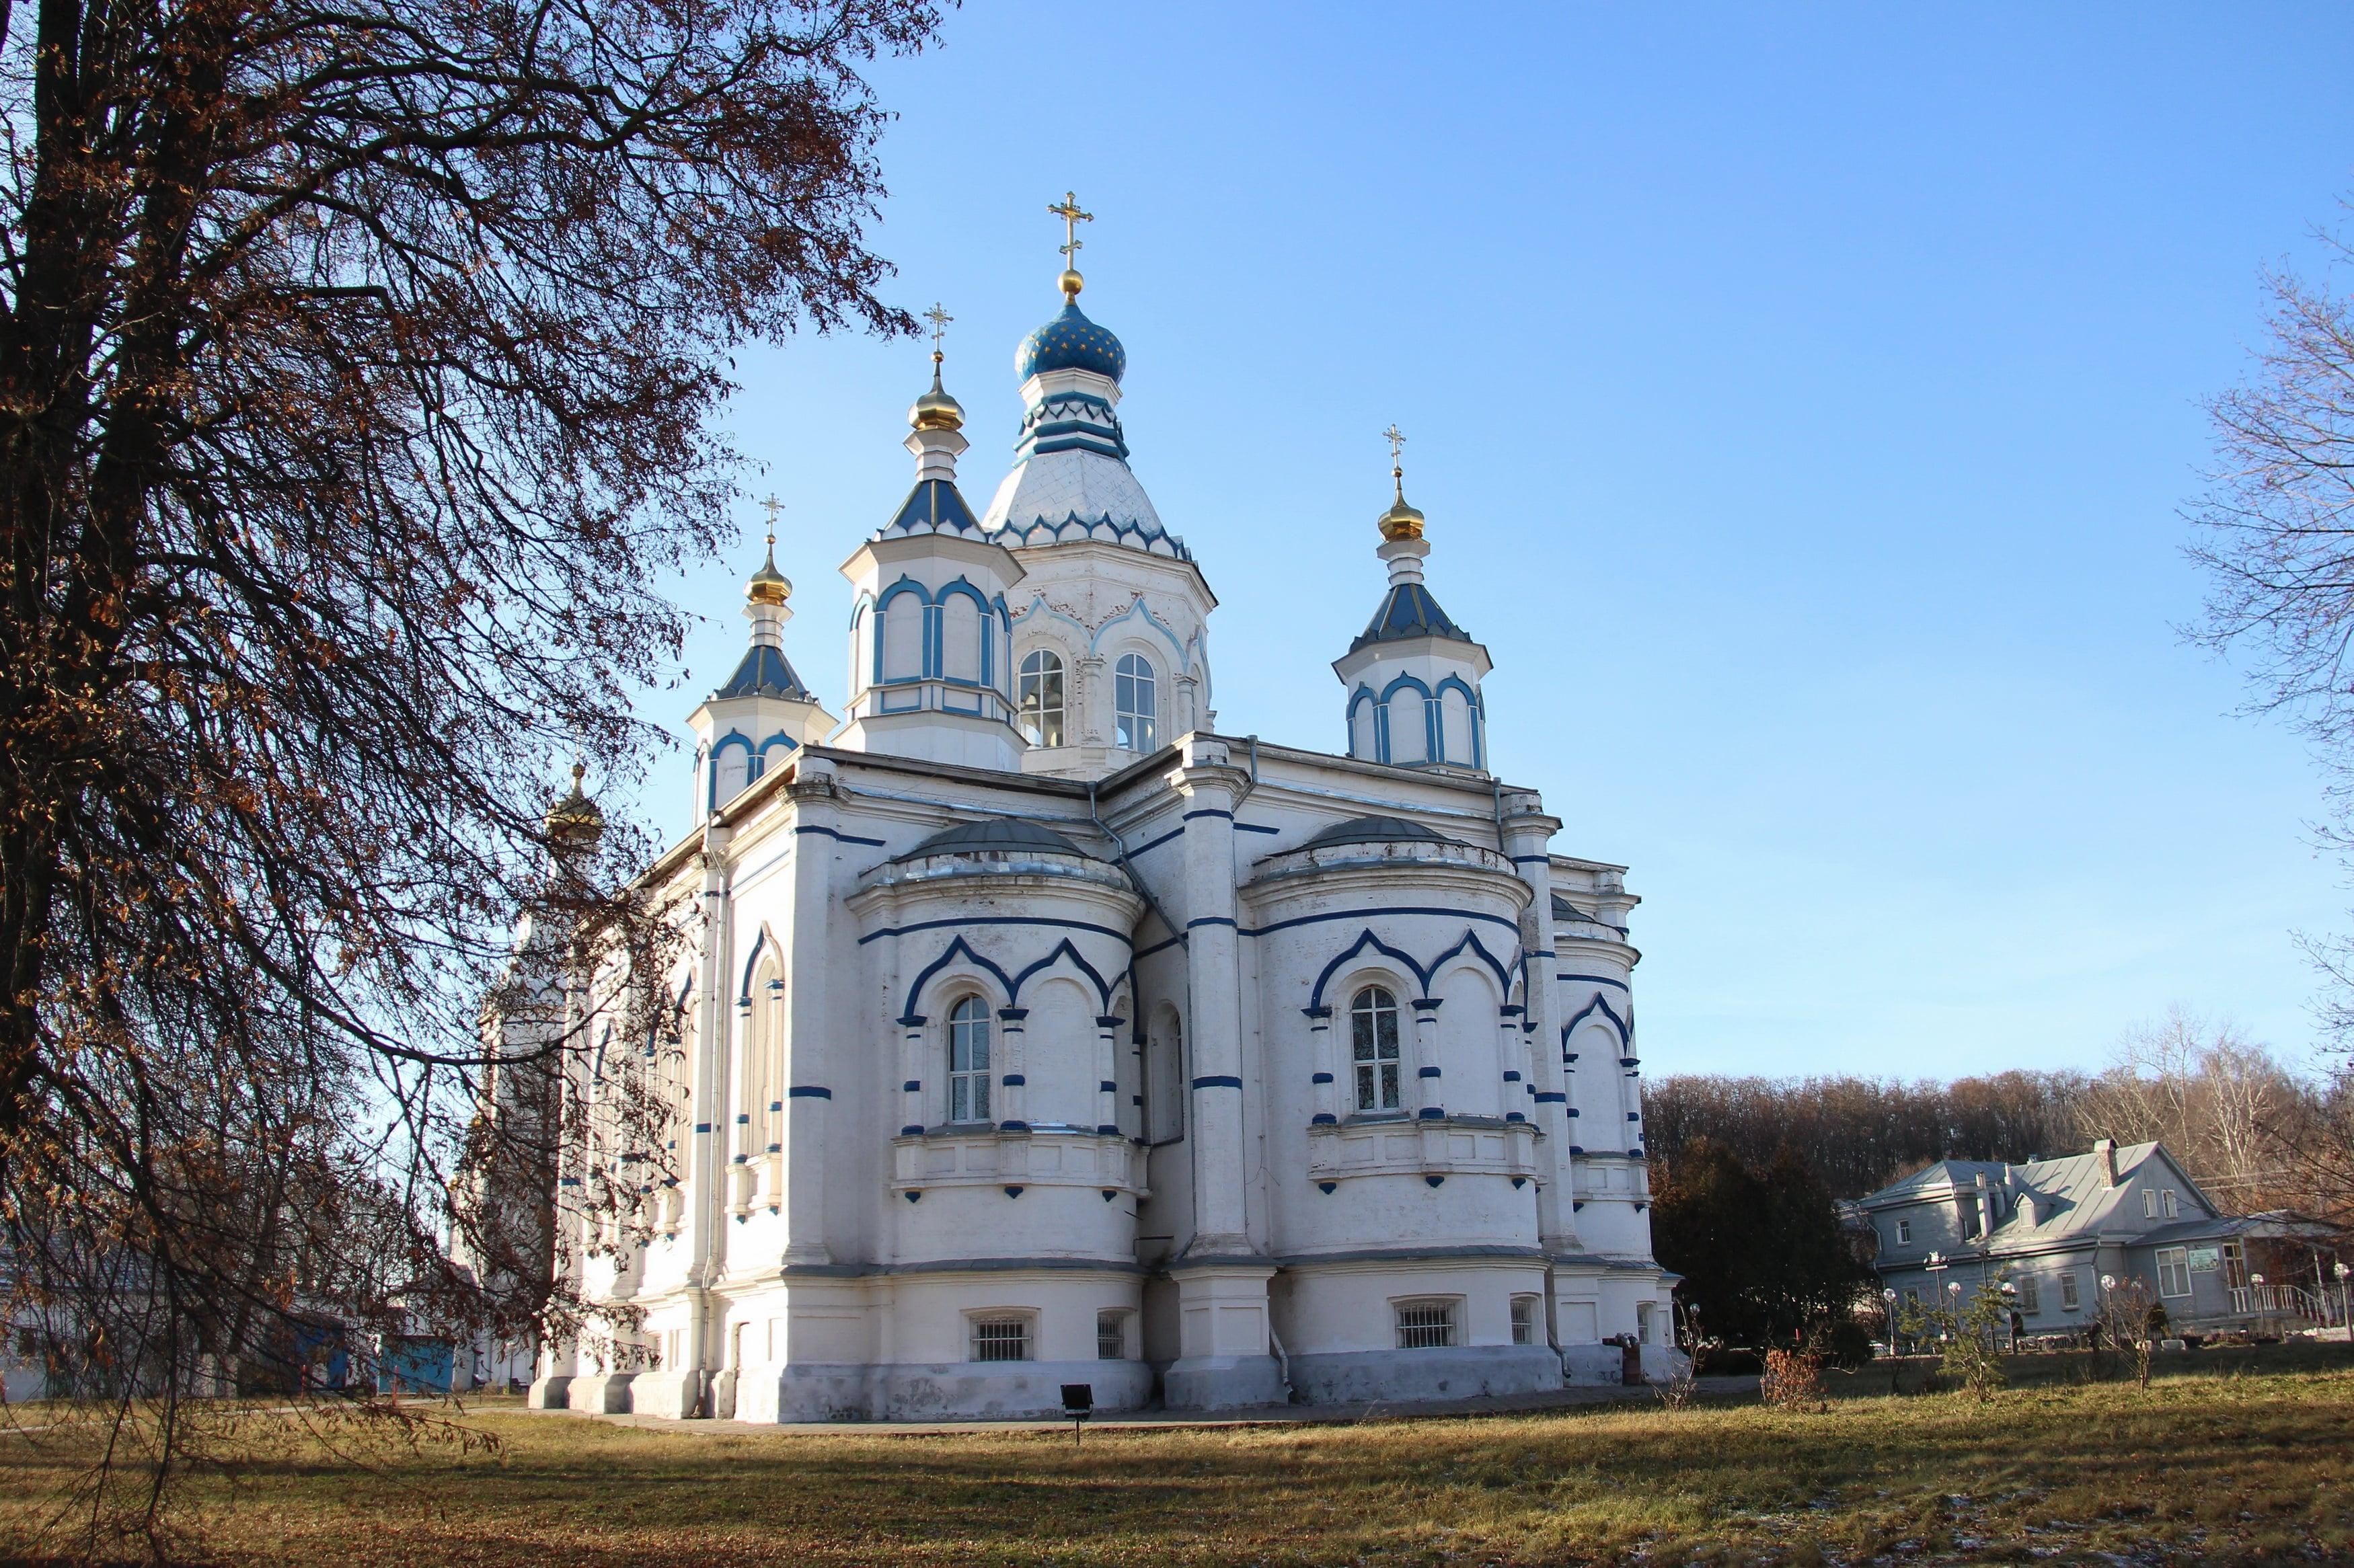 http://monuspen.ru/photoreports/86c3fe8f05ca1d8531e3cf8086d35cdc.JPG